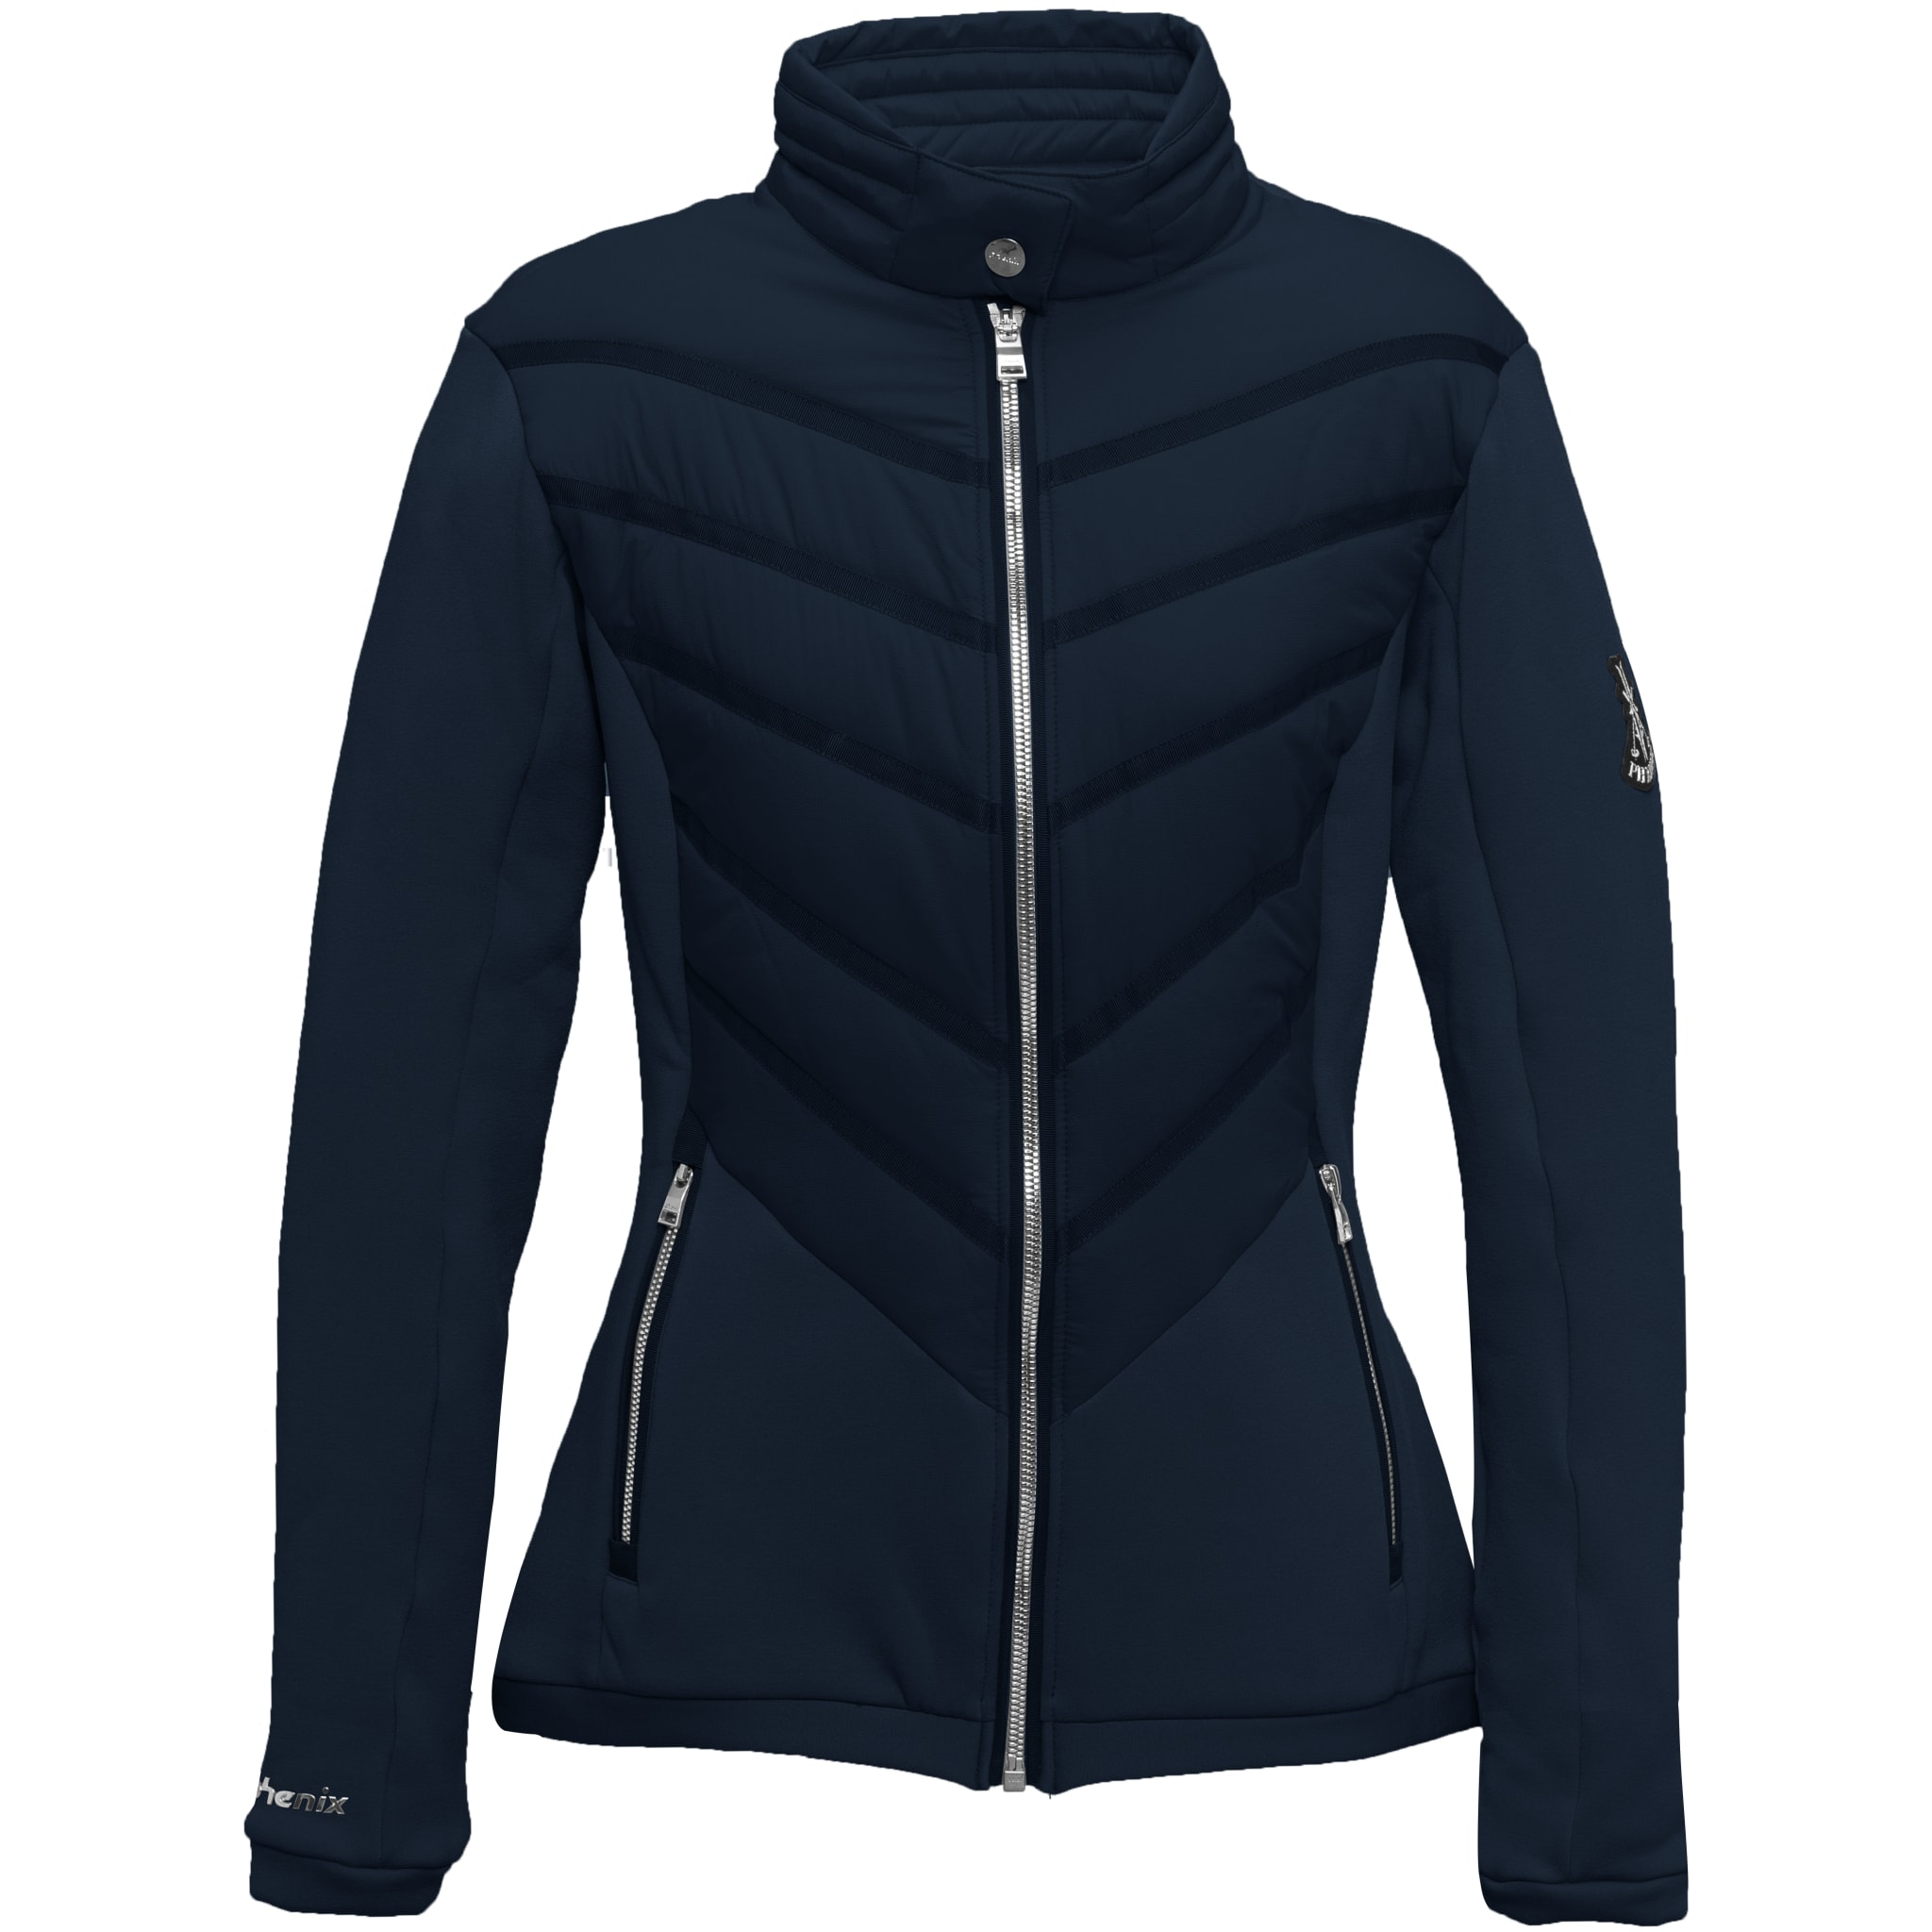 Michelle Middle Jacket